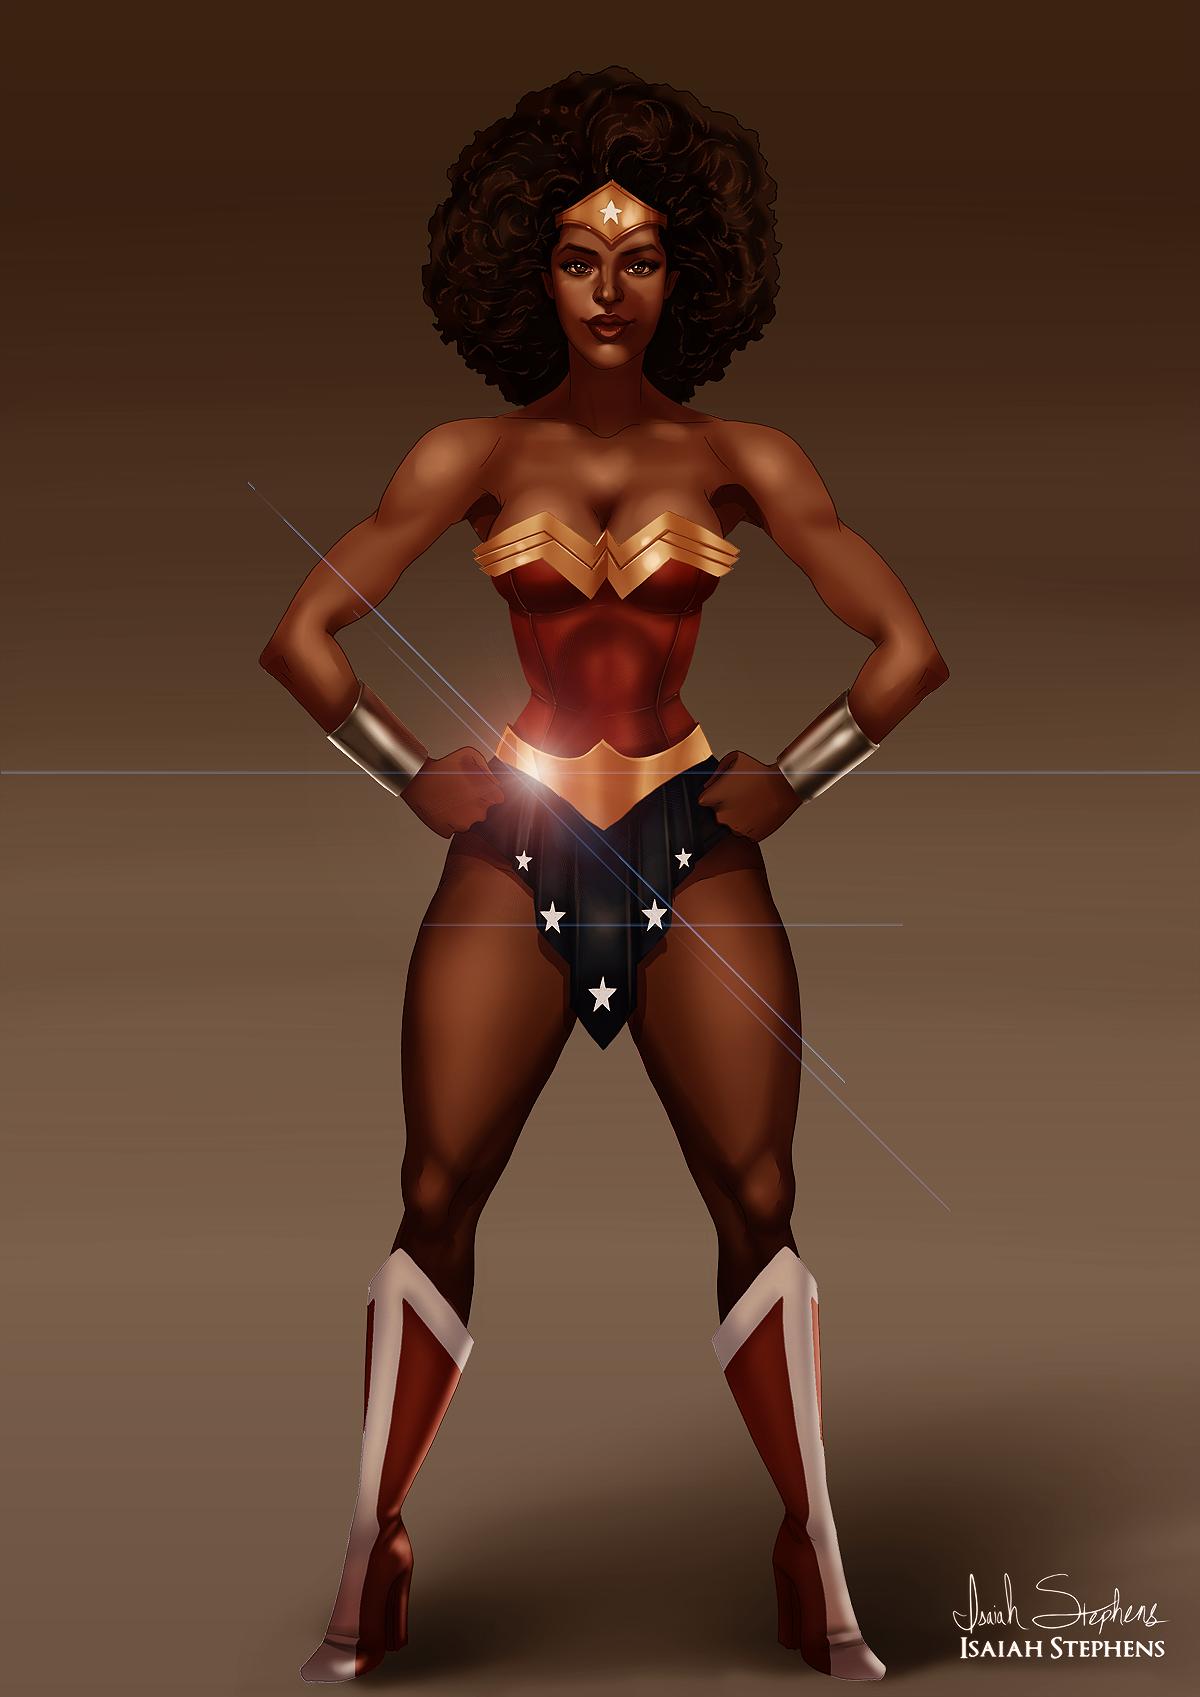 Isaiah Stephens Art And Illustration Black Heroes Project Wonder Woman Black Women Art Black Is Beautiful Wonder Woman